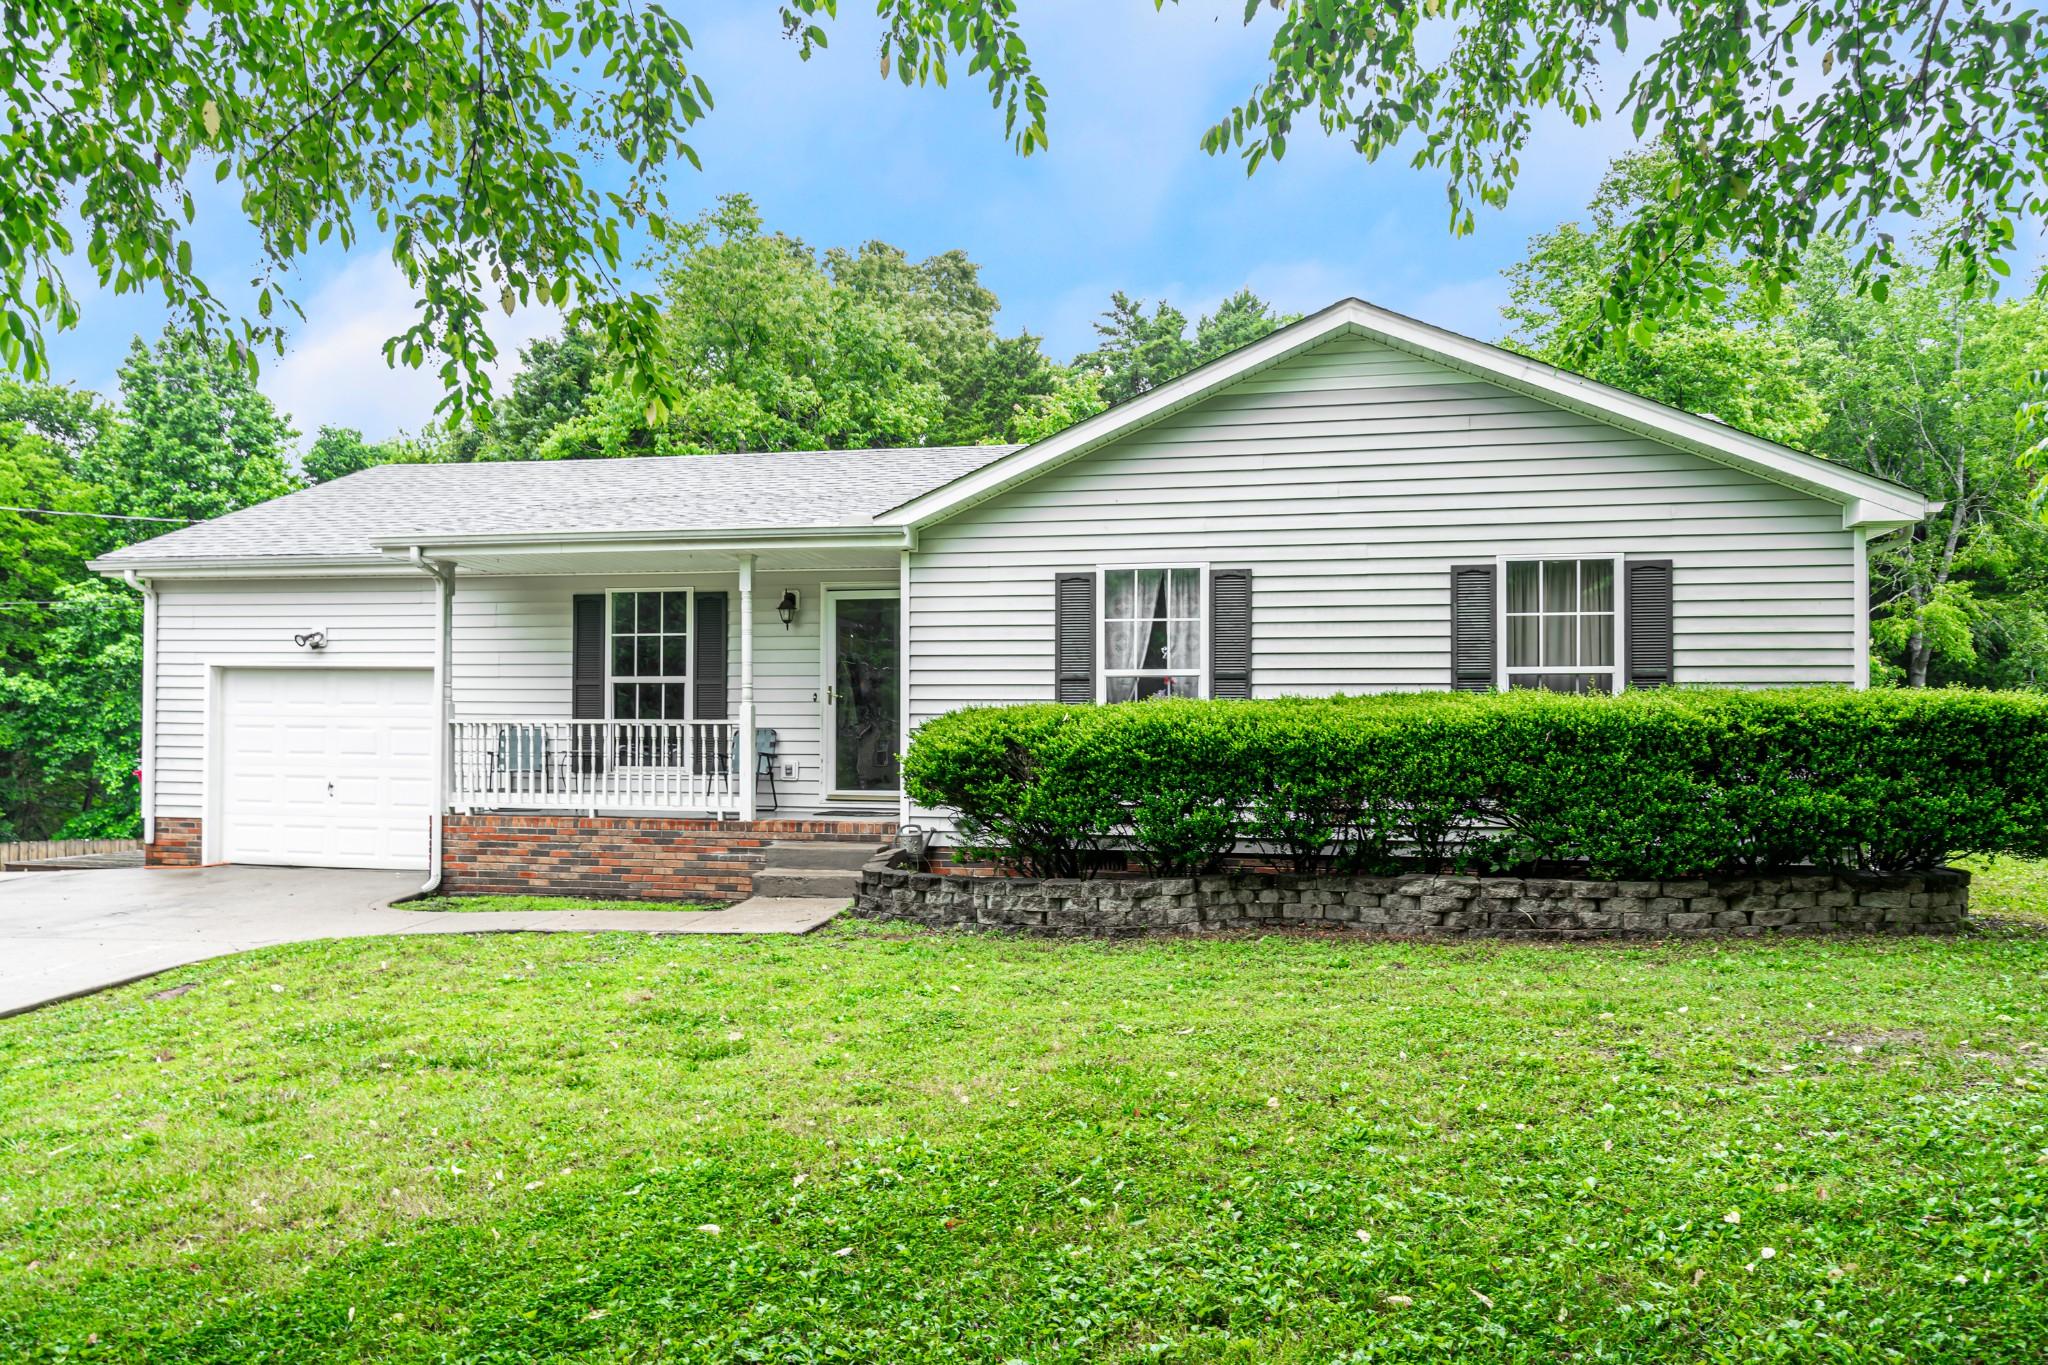 3517 Hunters Rdg Property Photo - Woodlawn, TN real estate listing